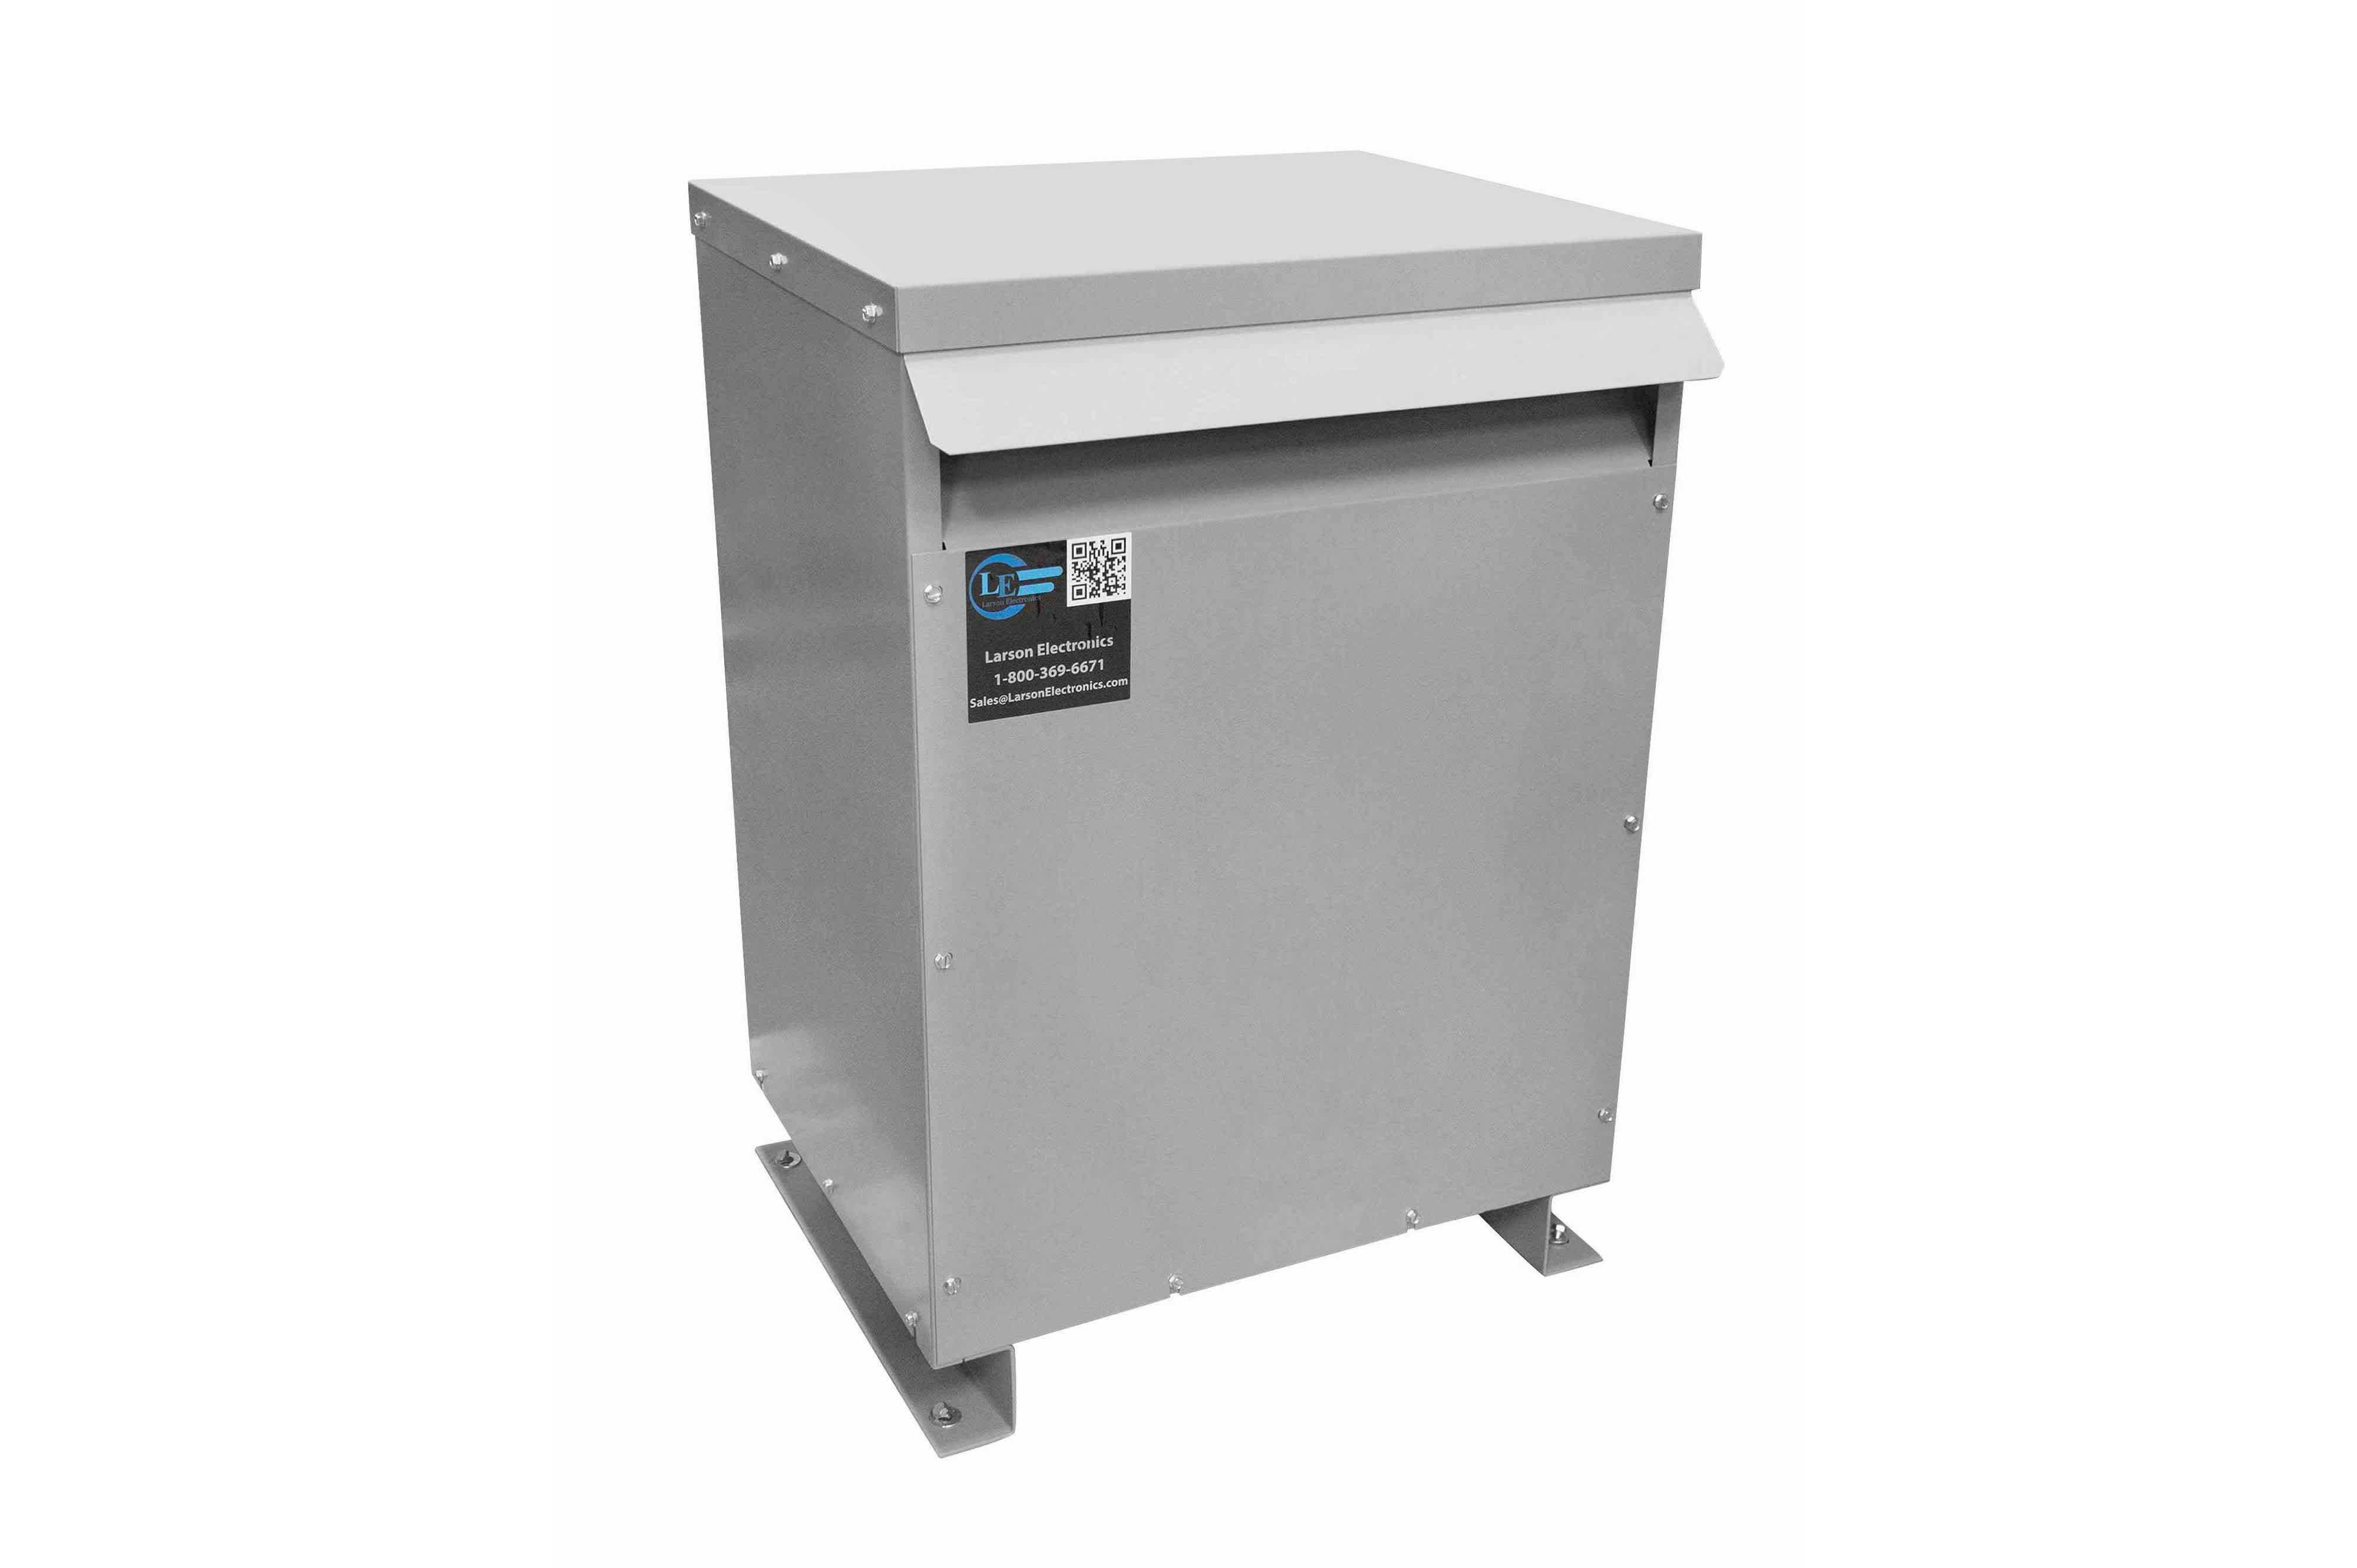 900 kVA 3PH Isolation Transformer, 480V Wye Primary, 400Y/231 Wye-N Secondary, N3R, Ventilated, 60 Hz